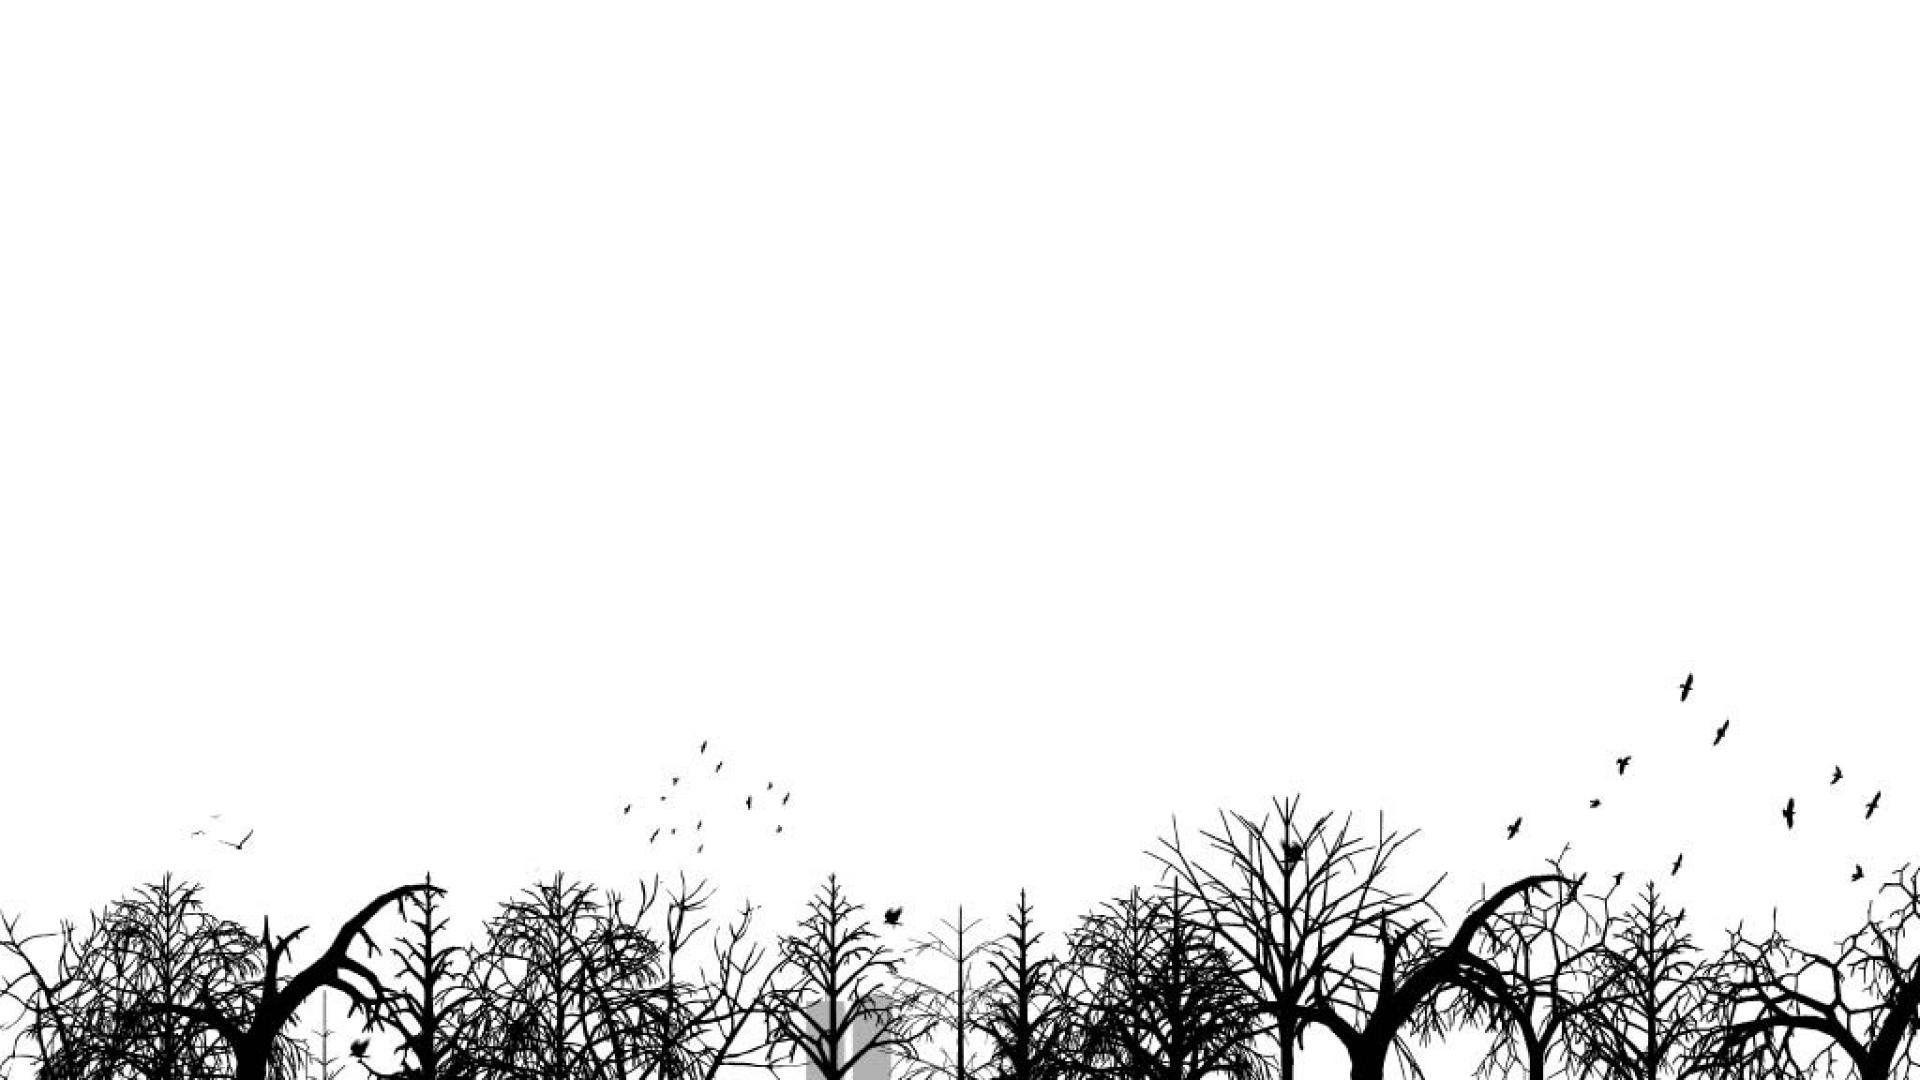 Selimut bulu polos uk 200 x 230cm list pinggir halus tebal. Soft White Aesthetic Wallpapers - Top Free Soft White